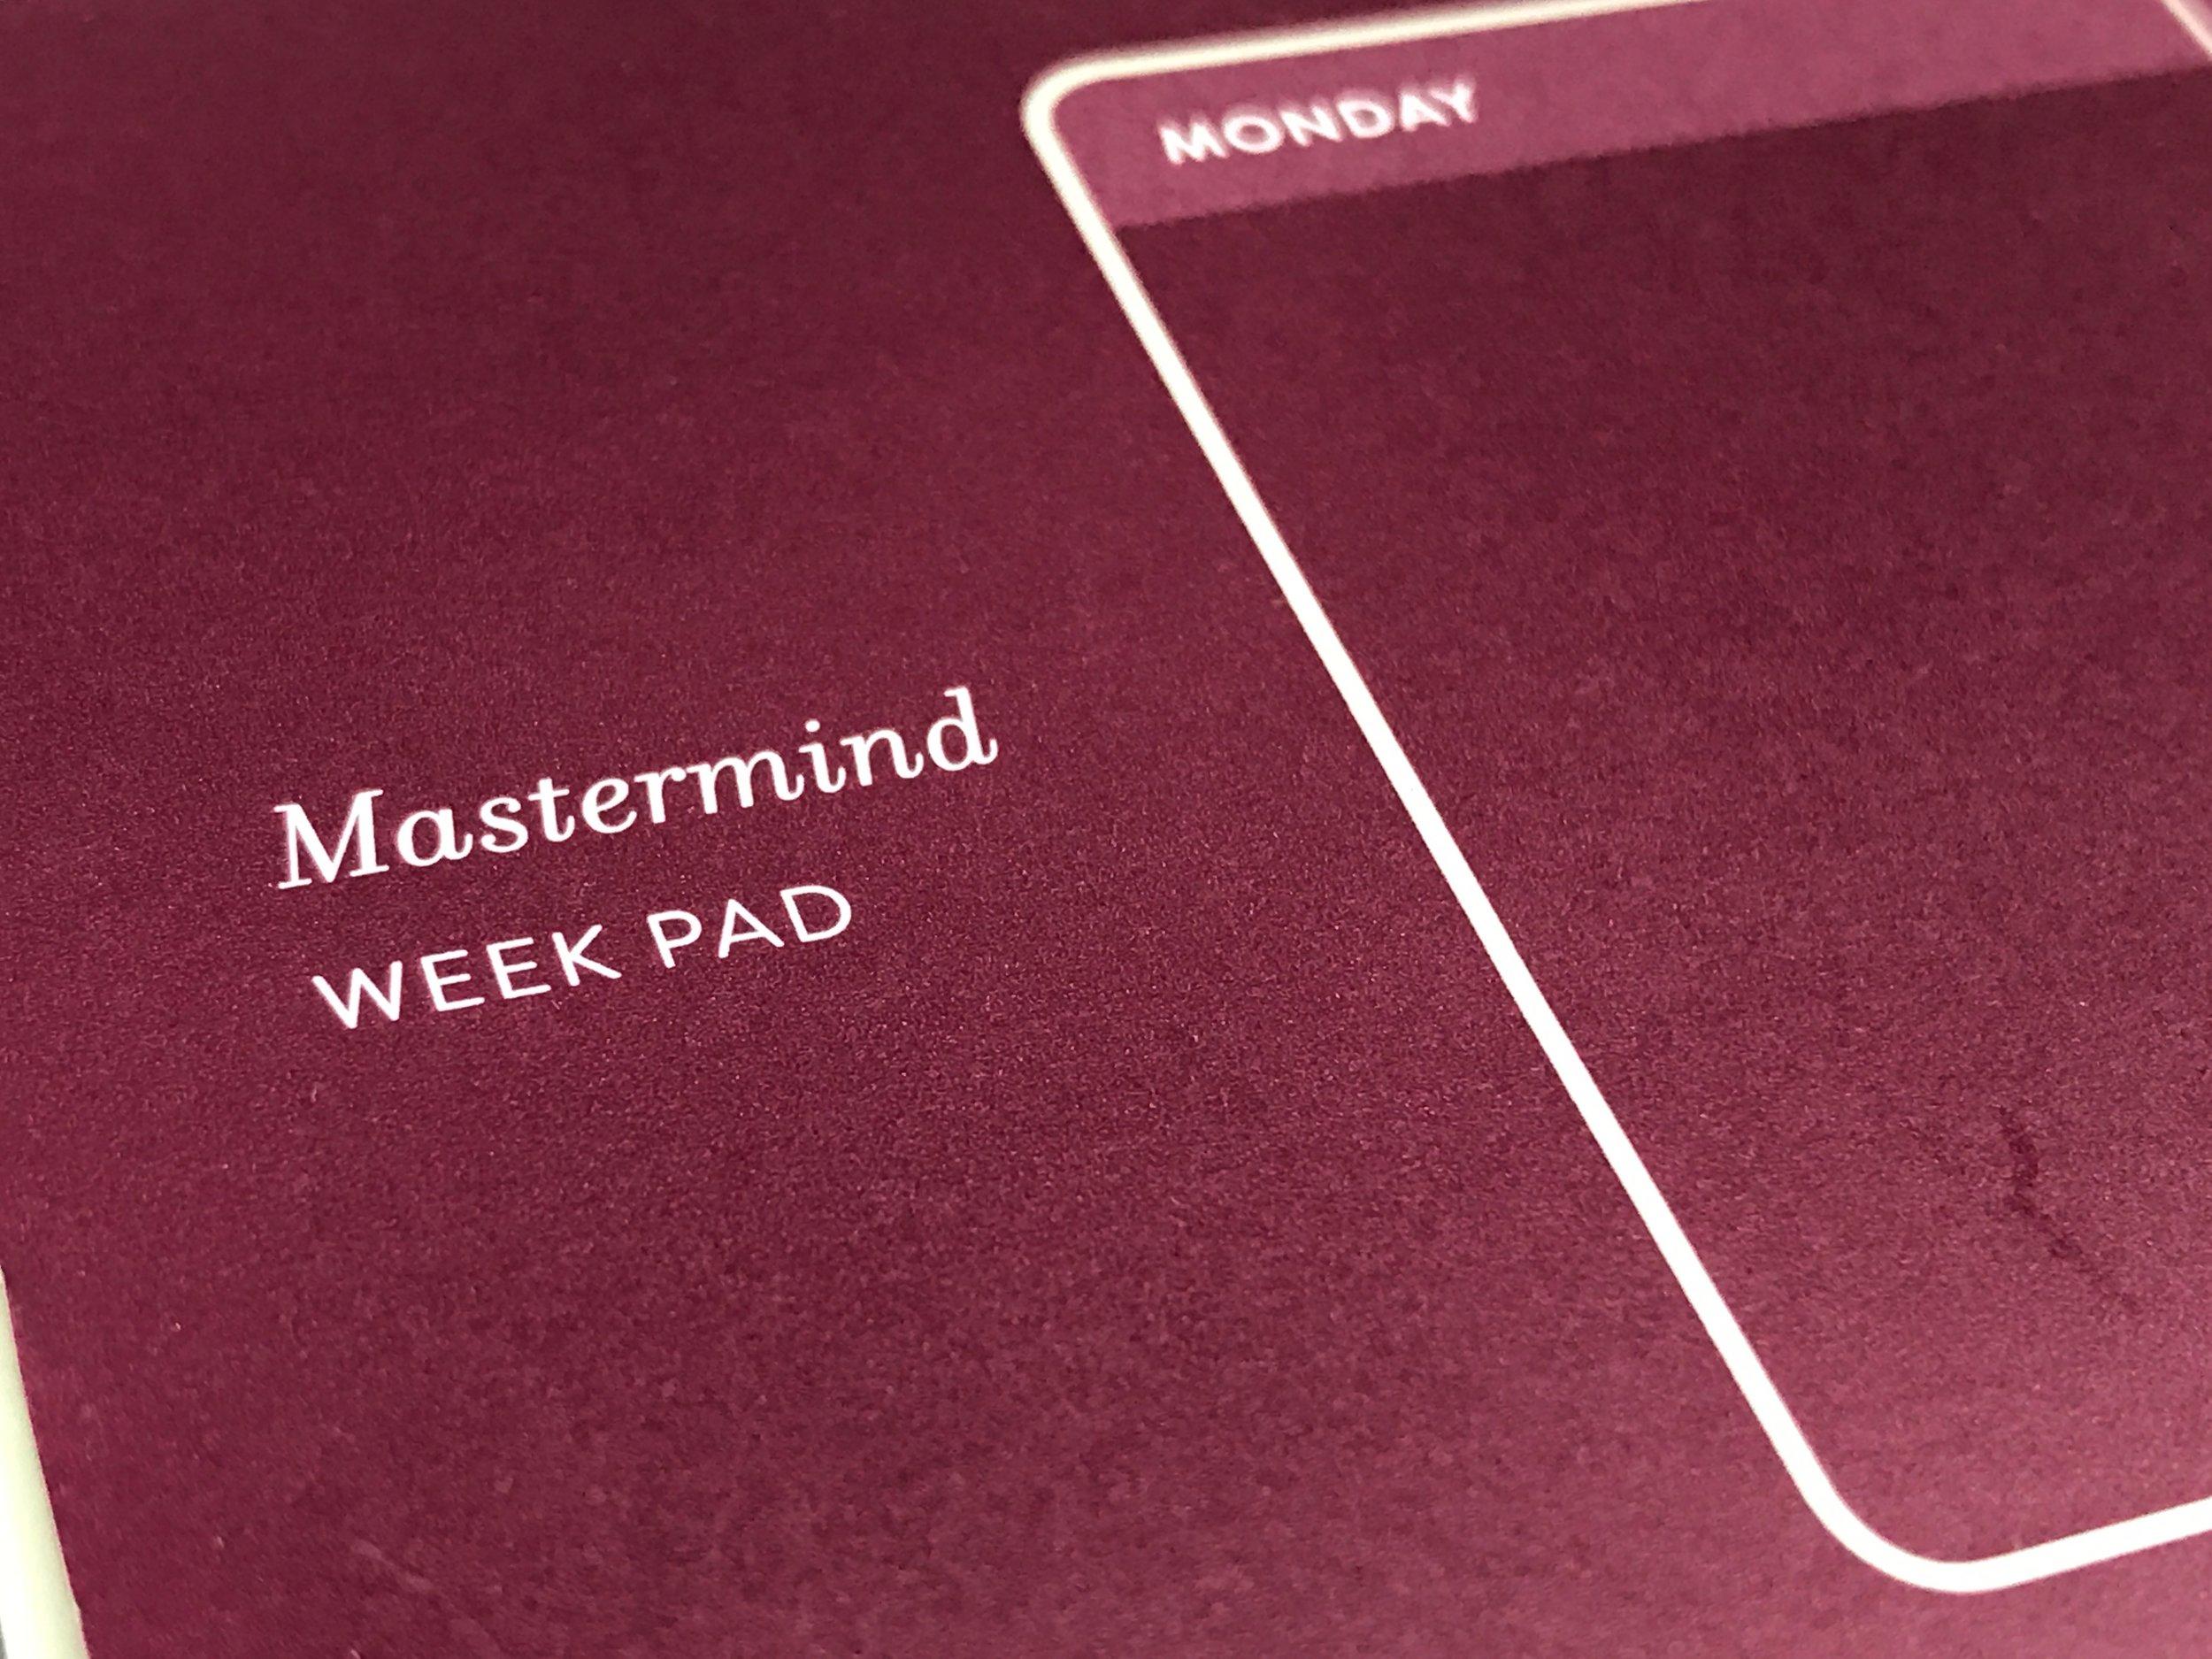 baron-fig-mastermind-week-pad-2.jpg